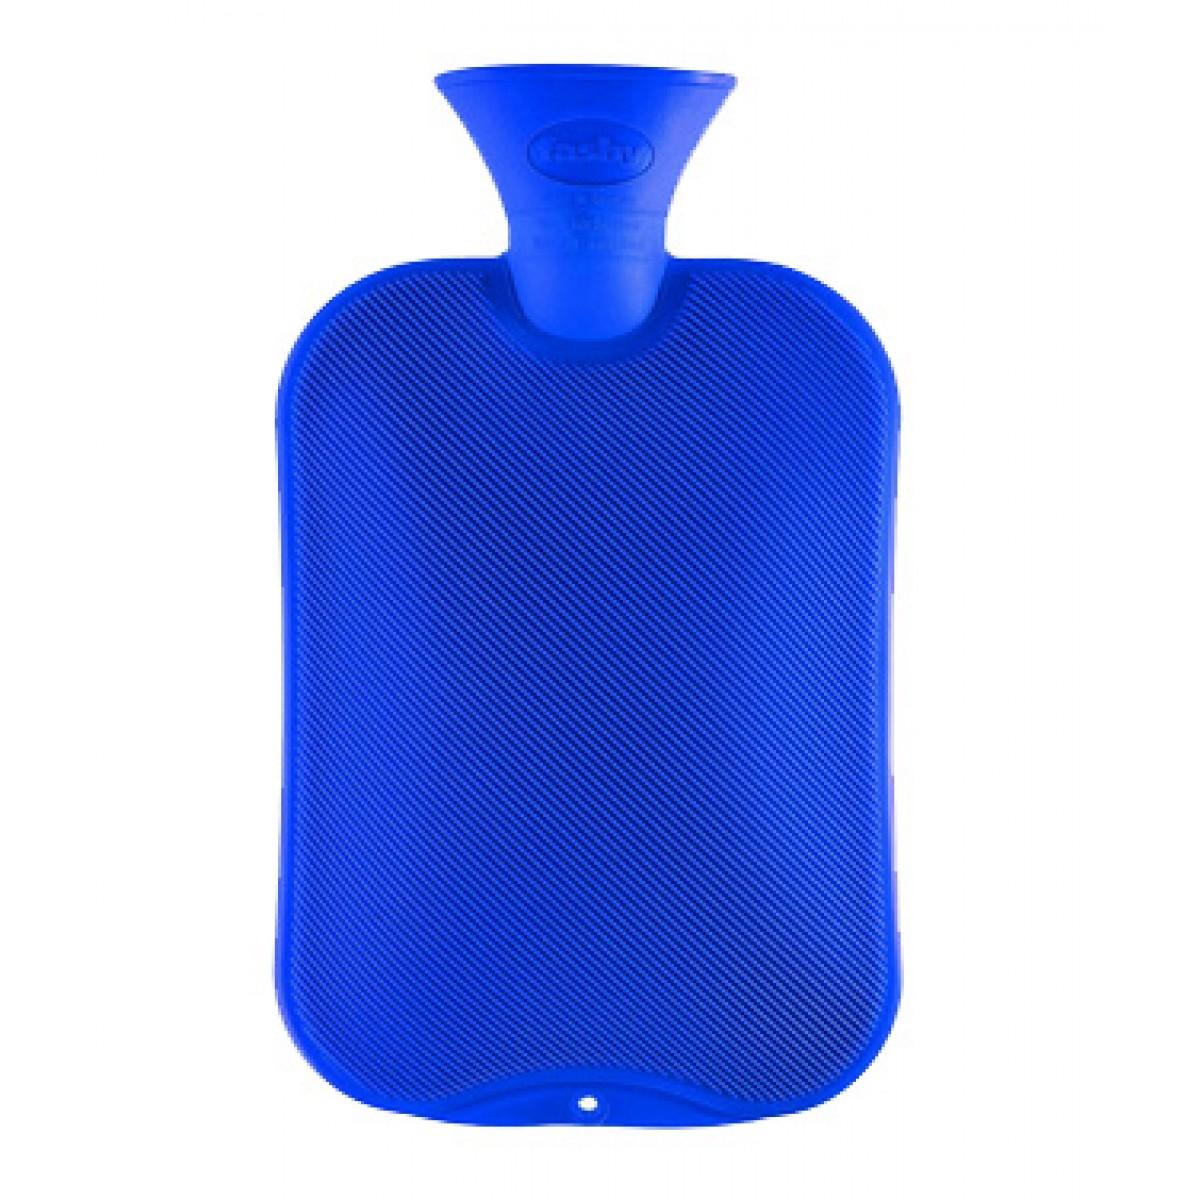 bd884b2de0b Fashy kruik 2 liter | Blauw | enkelzijdig geribbeld